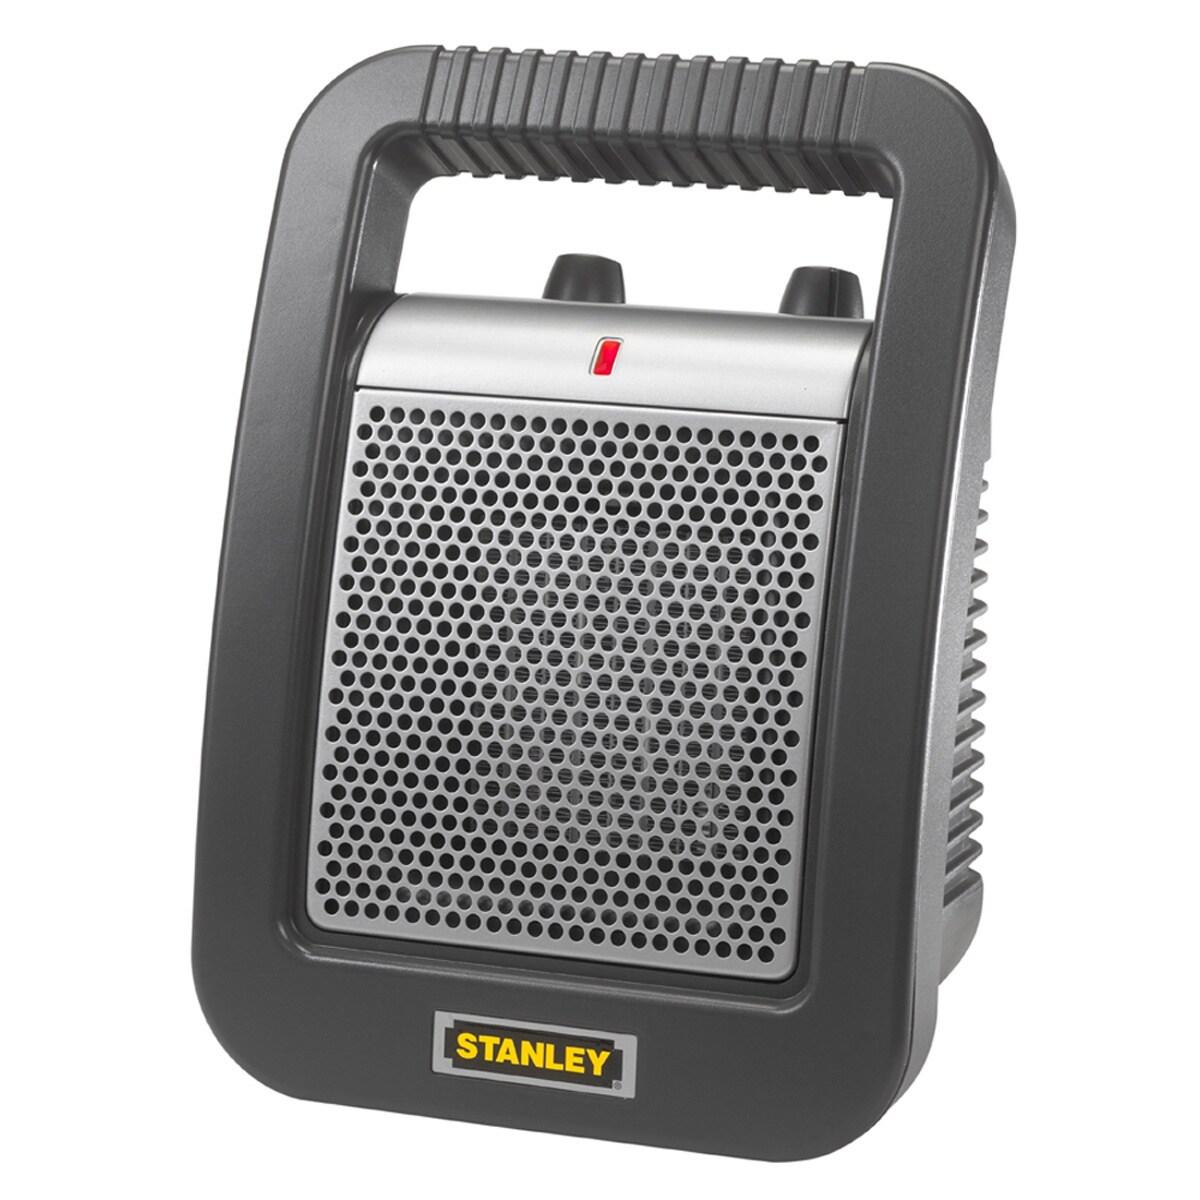 Lasko 675945 Stanley Ceramic Utility Heater w/ Adjustable...